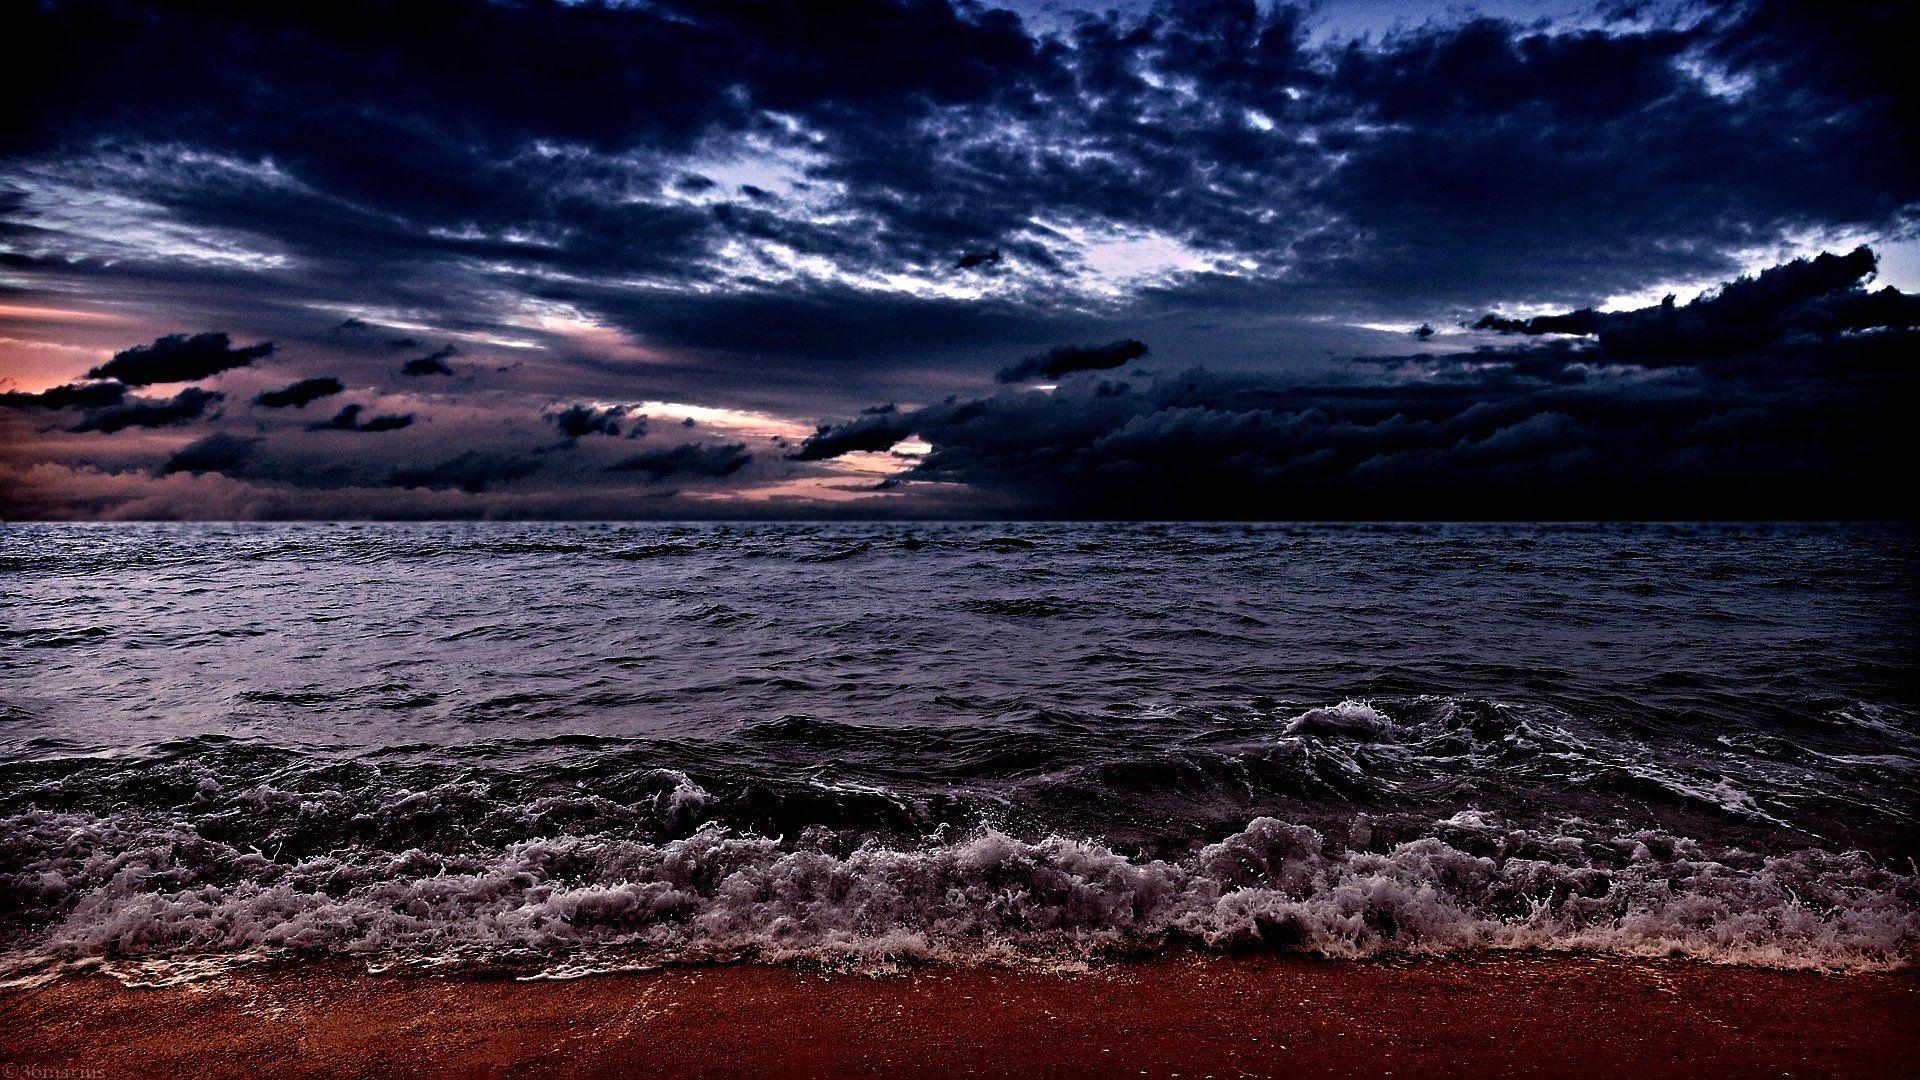 Dark Ocean Wallpaper Full Hd F4z Ocean Ocean Storm Ocean Wallpaper